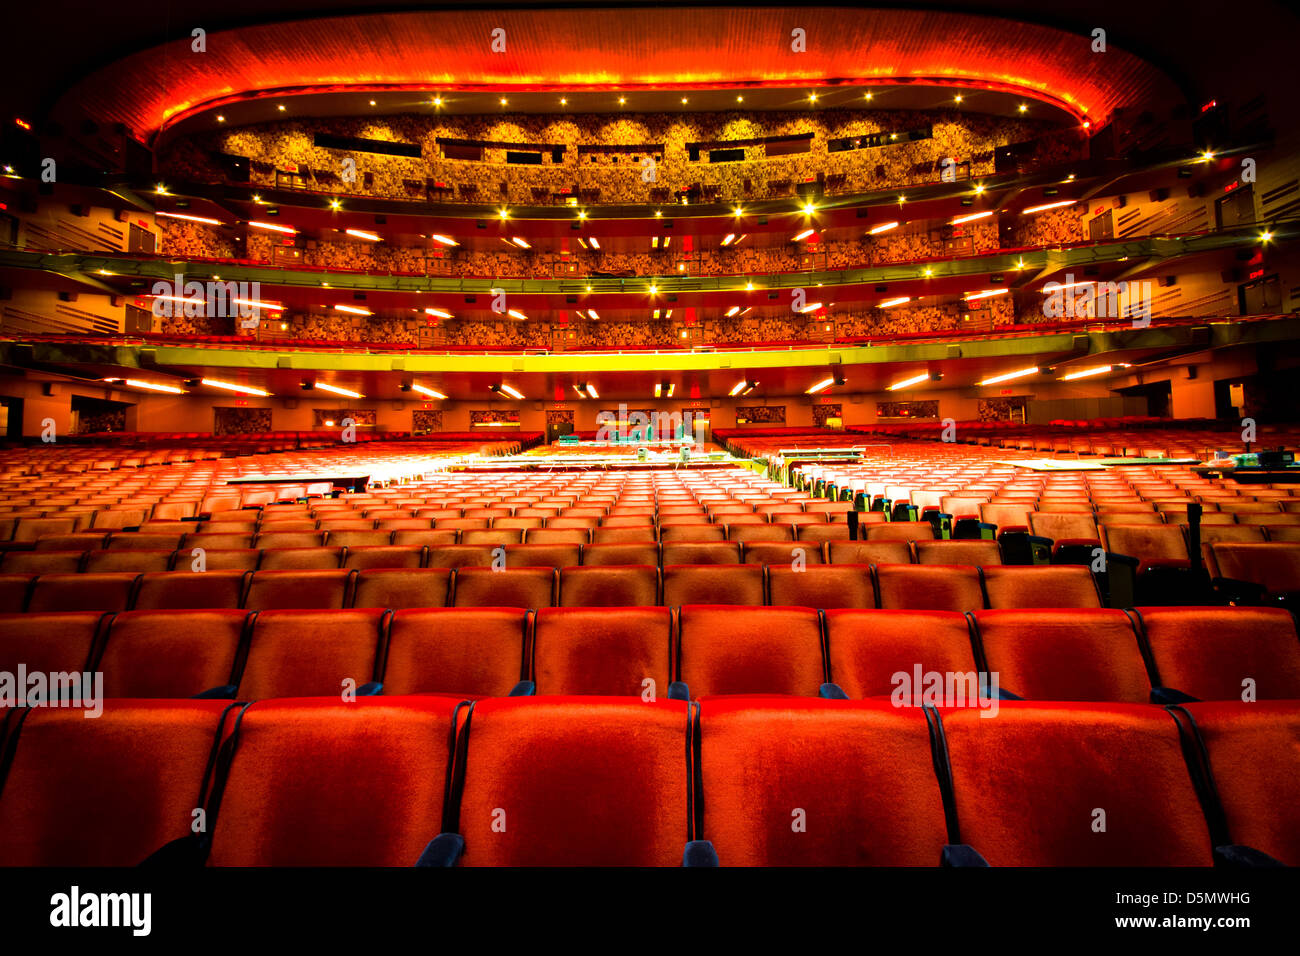 NEW YORK CITY - JAN 12: Nostalgic view of Radio City Music Hall in midtown Manhattan on Jan 12 2013. This historic - Stock Image